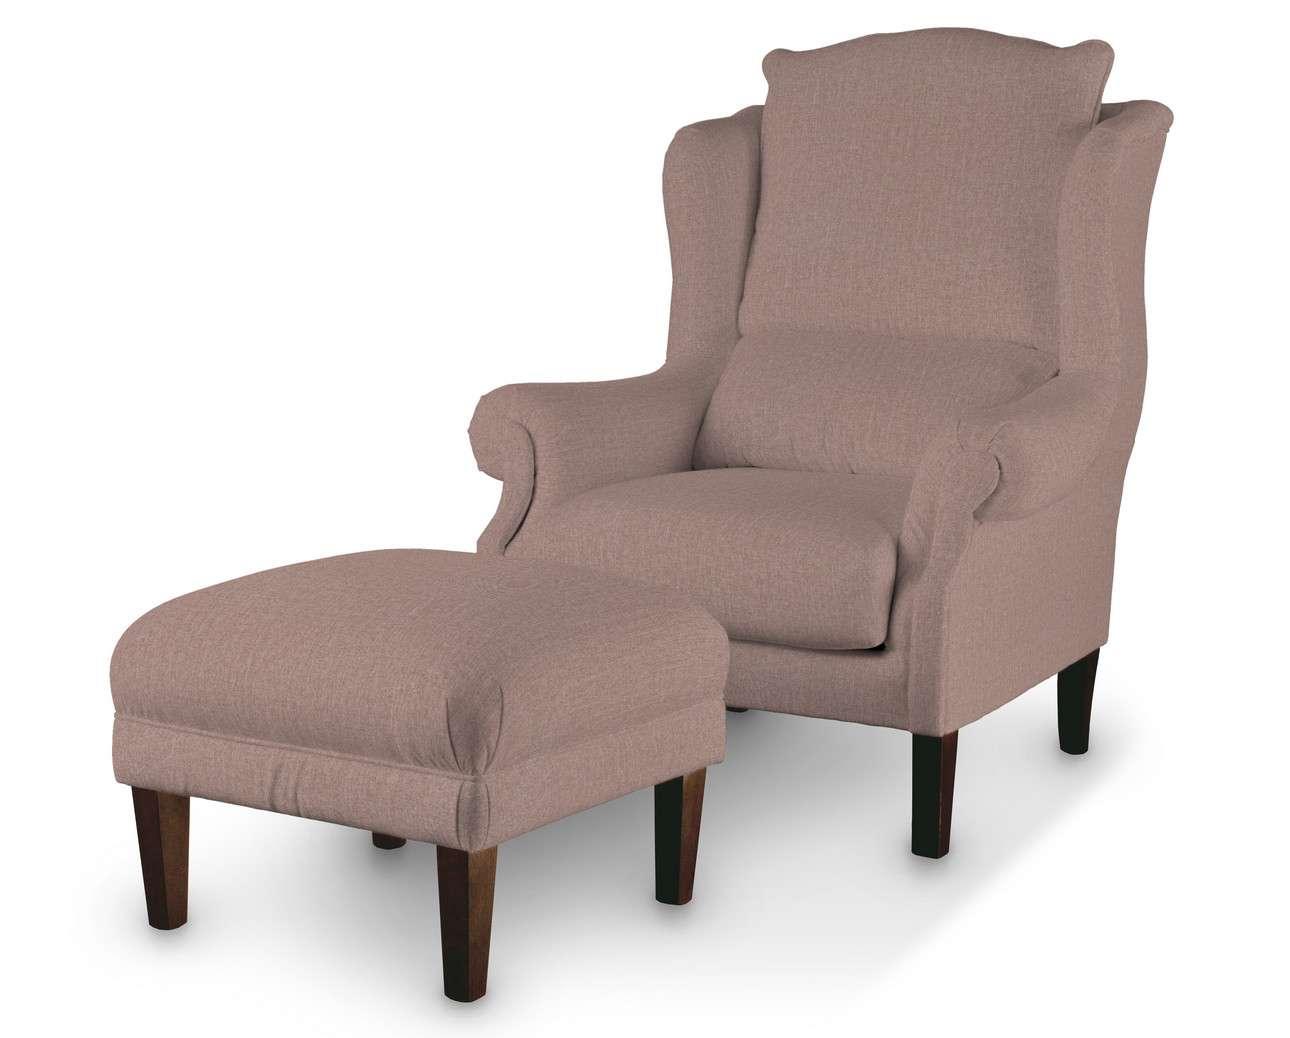 Podnóżek do fotela w kolekcji City, tkanina: 704-83